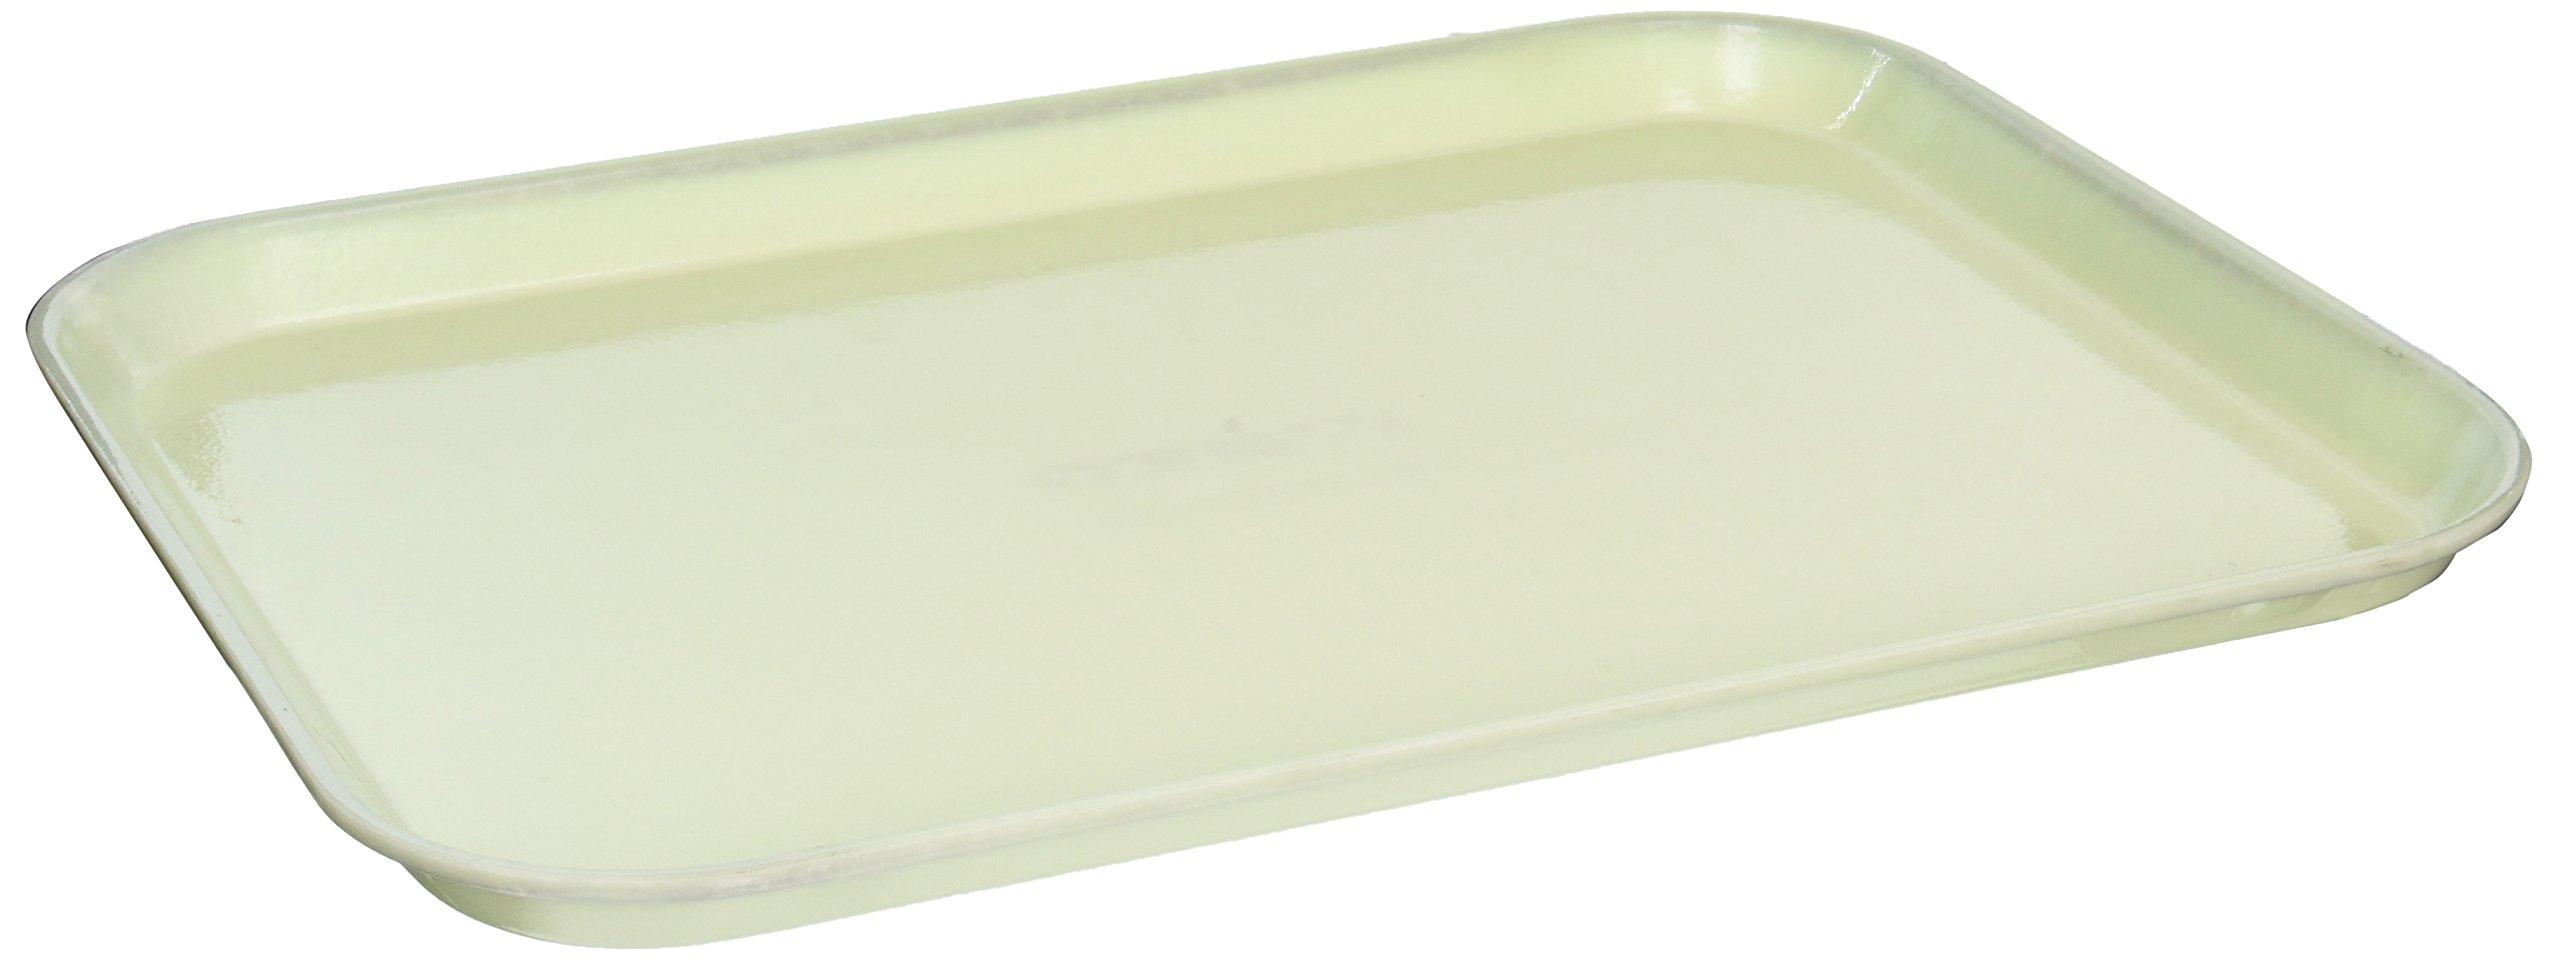 Winco FGT-1418C Rectangular Fiberglass Tray, 14-Inch by 18-Inch, Cream